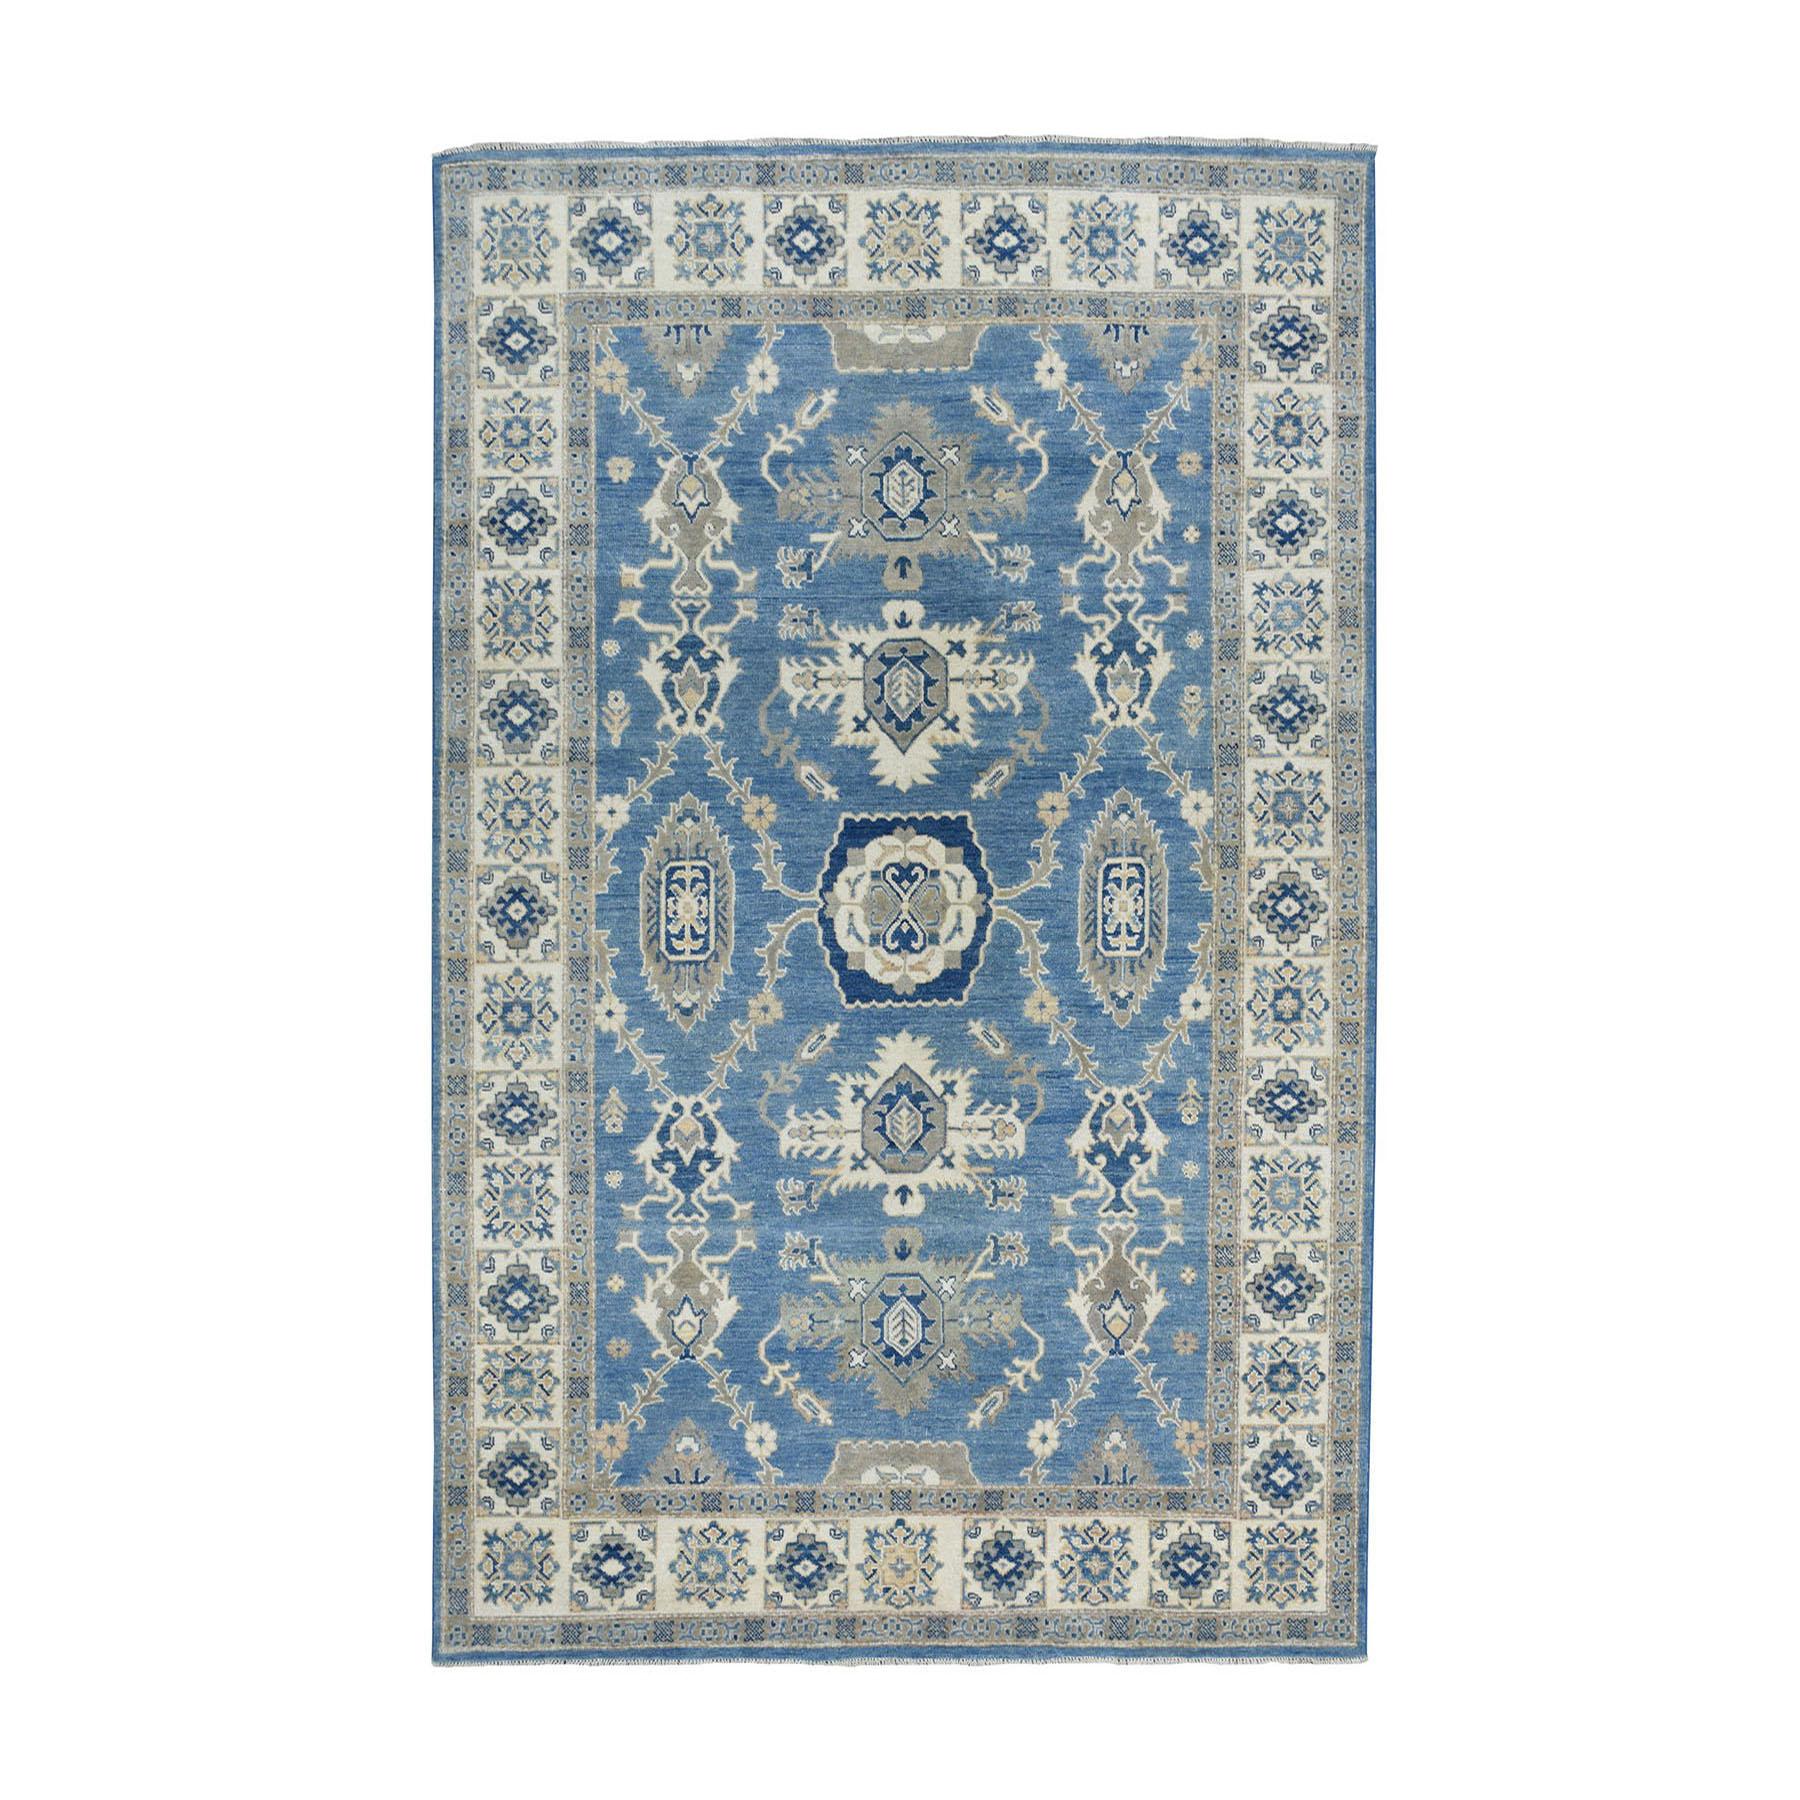 "6'2""X9' Blue Vintage Look Kazak Geometric Design Hand-Knotted Oriental Rug moaeaaae"